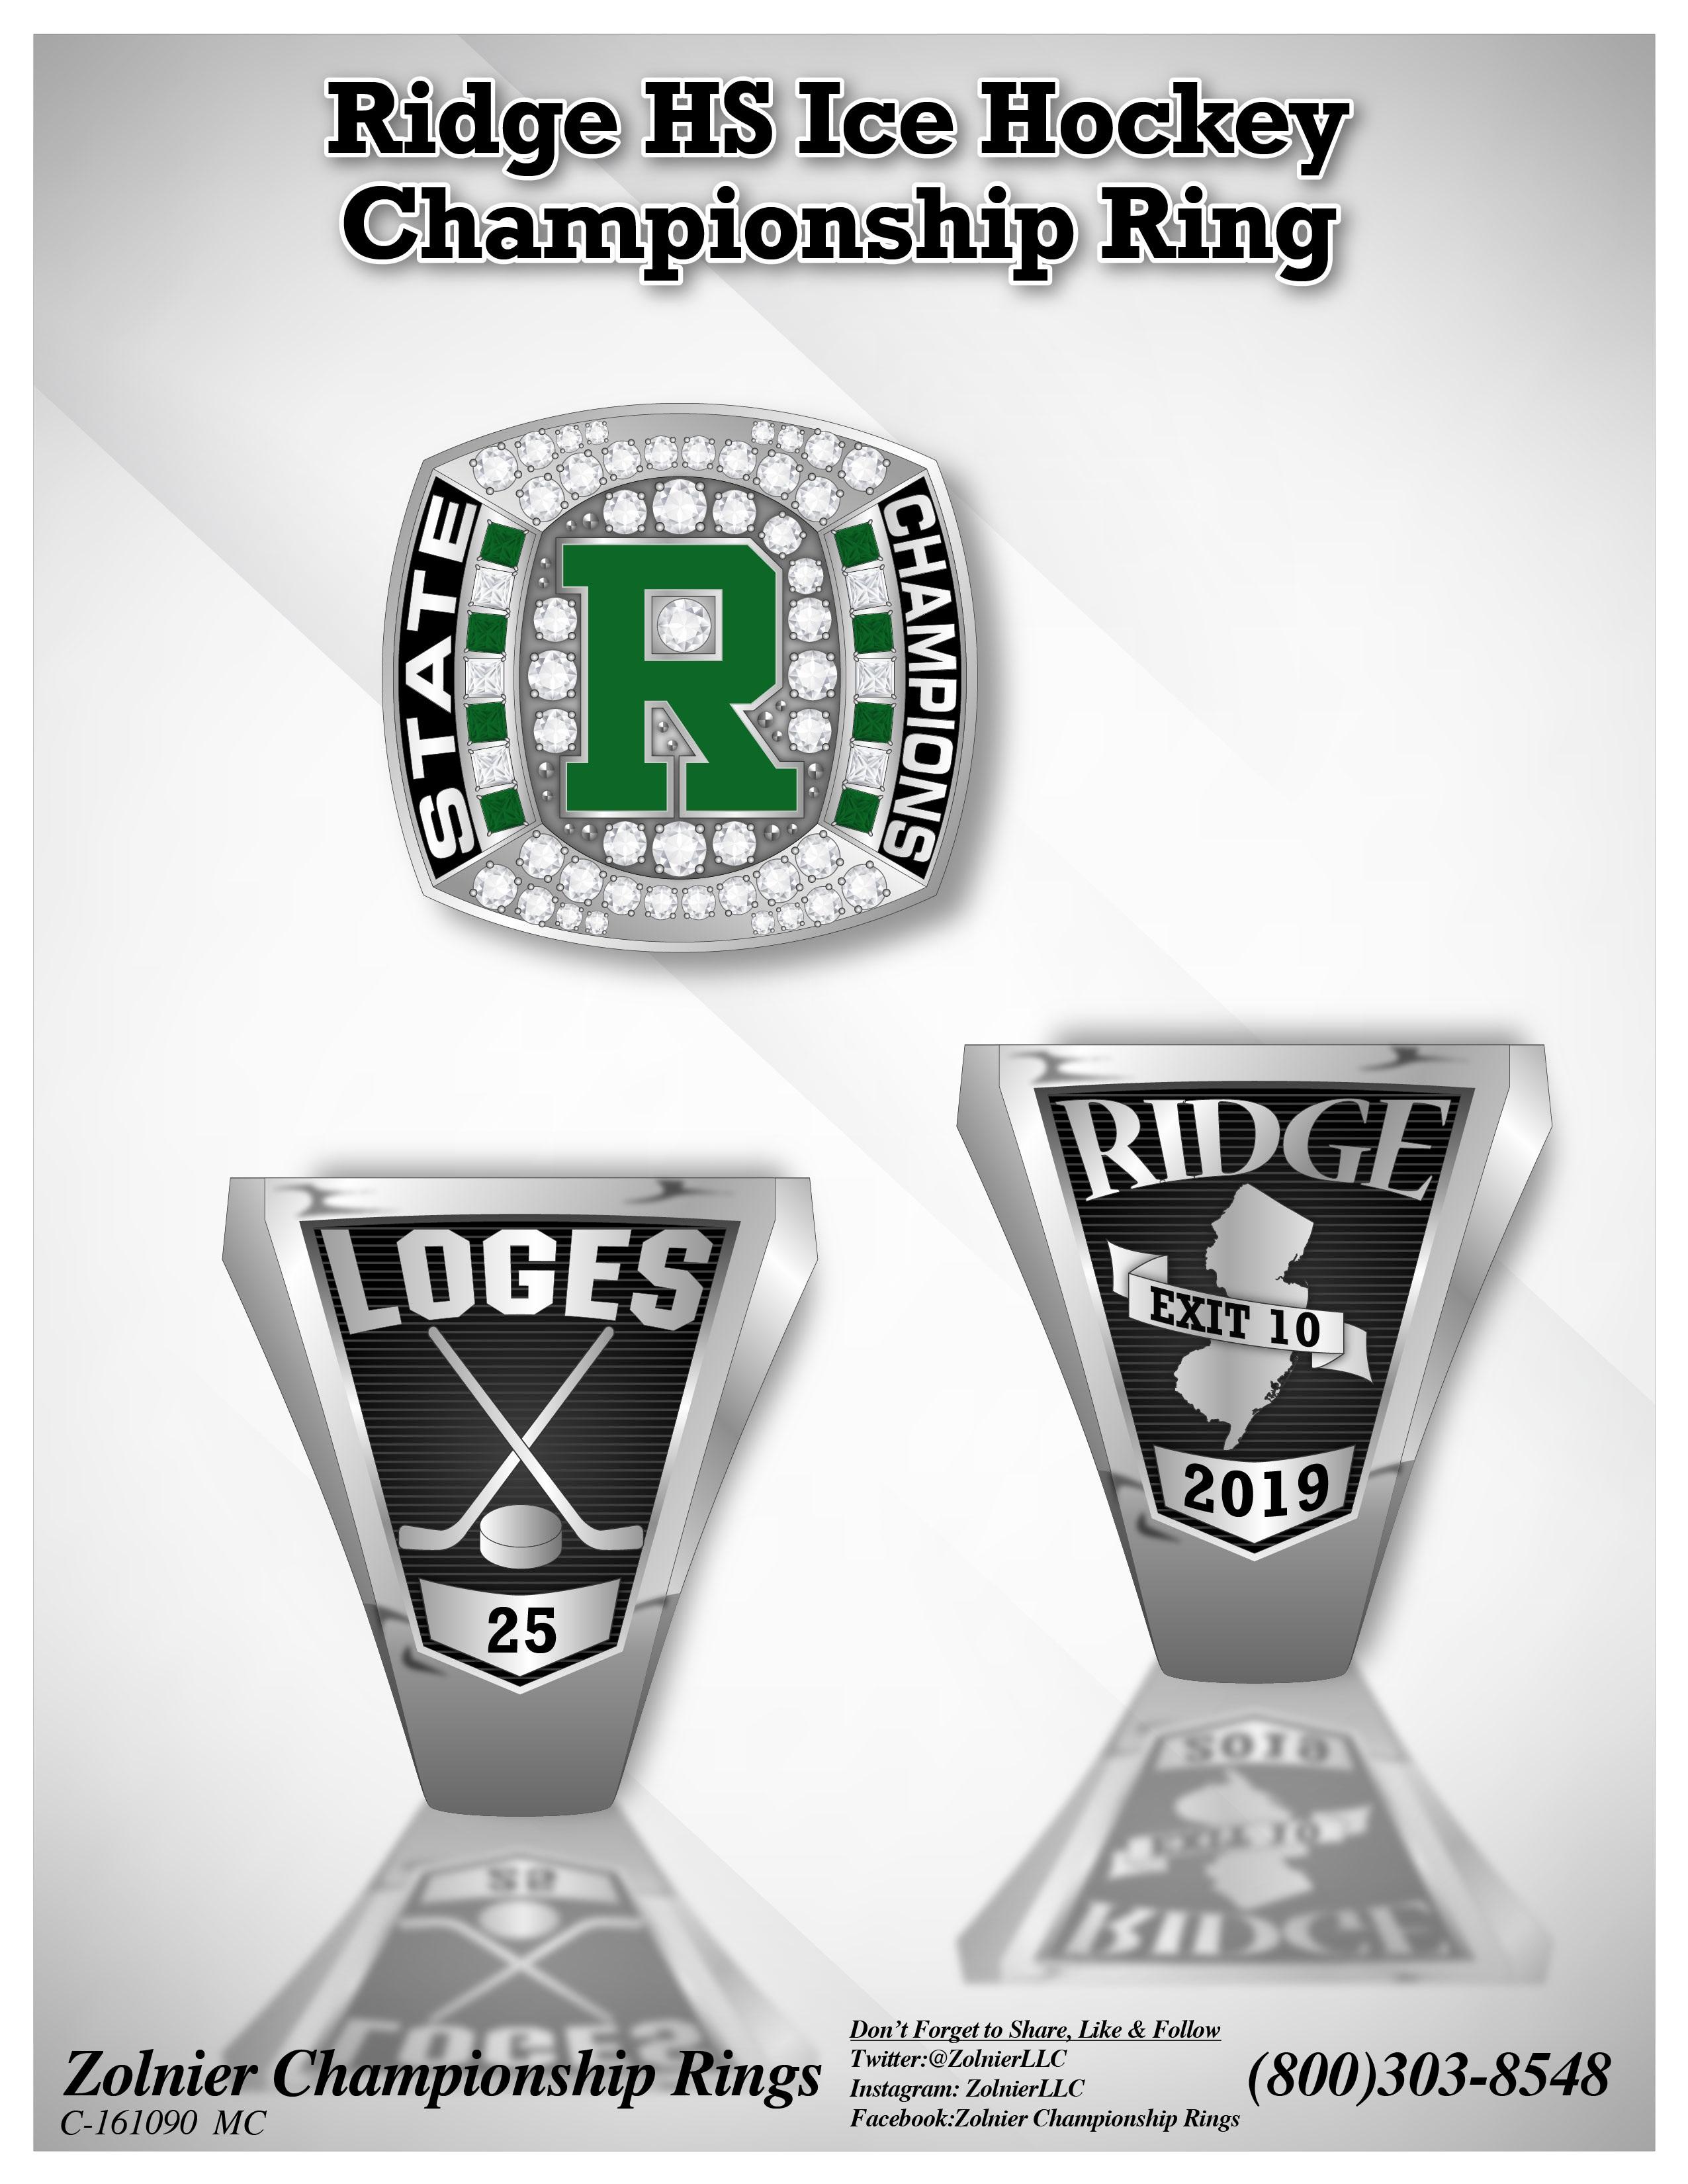 C-161090 Ridge HS Ice Hockey Champ Ring